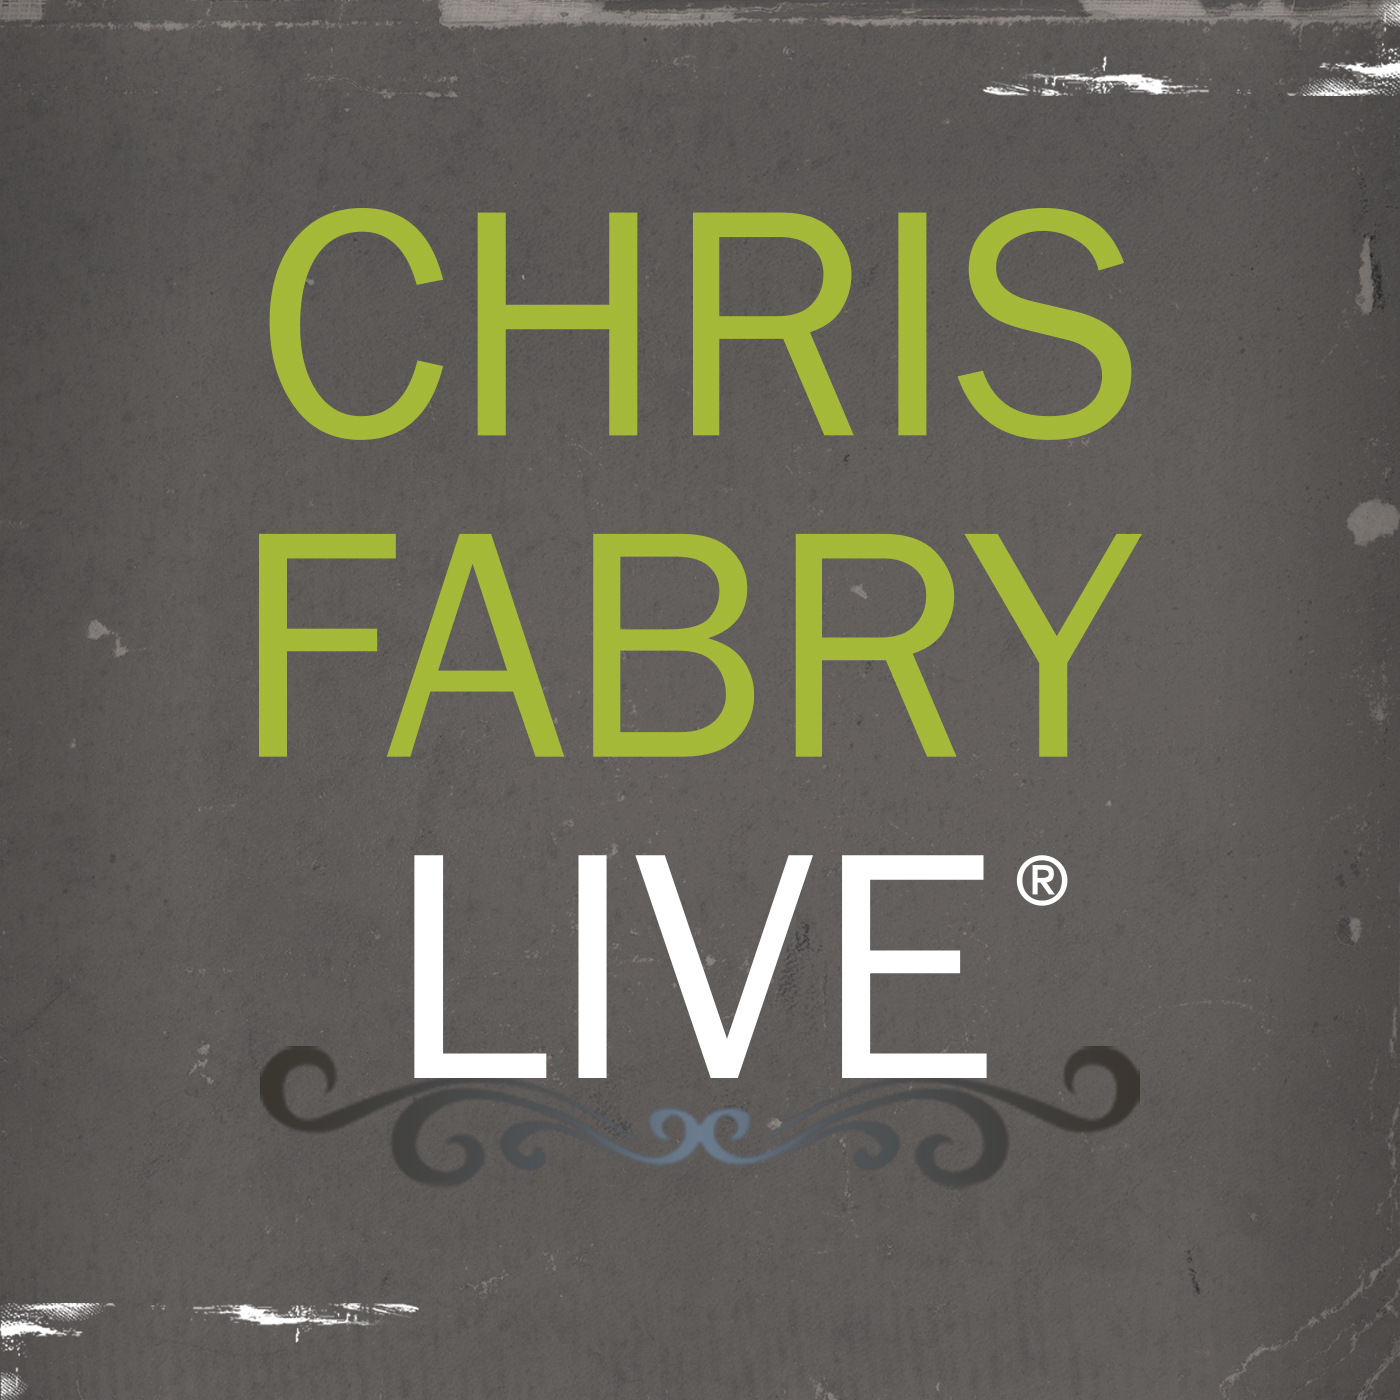 Chris Fabry Live